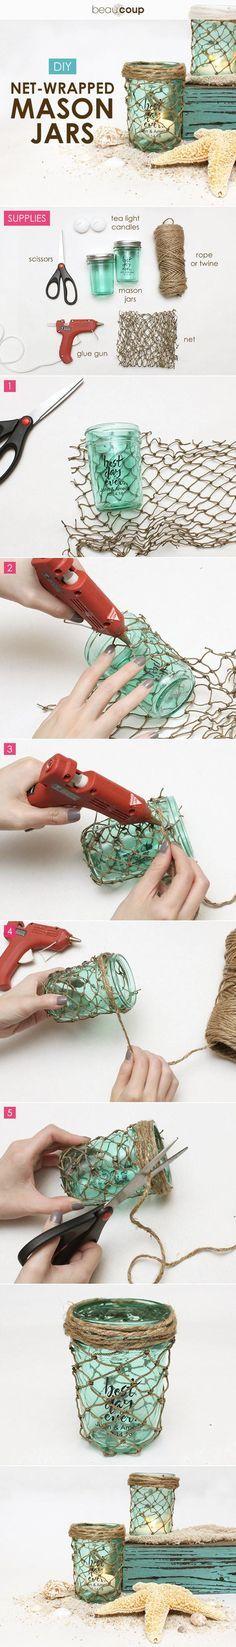 DIY Net-Wrapped Mason Jars For Easy Beach Themed Decor